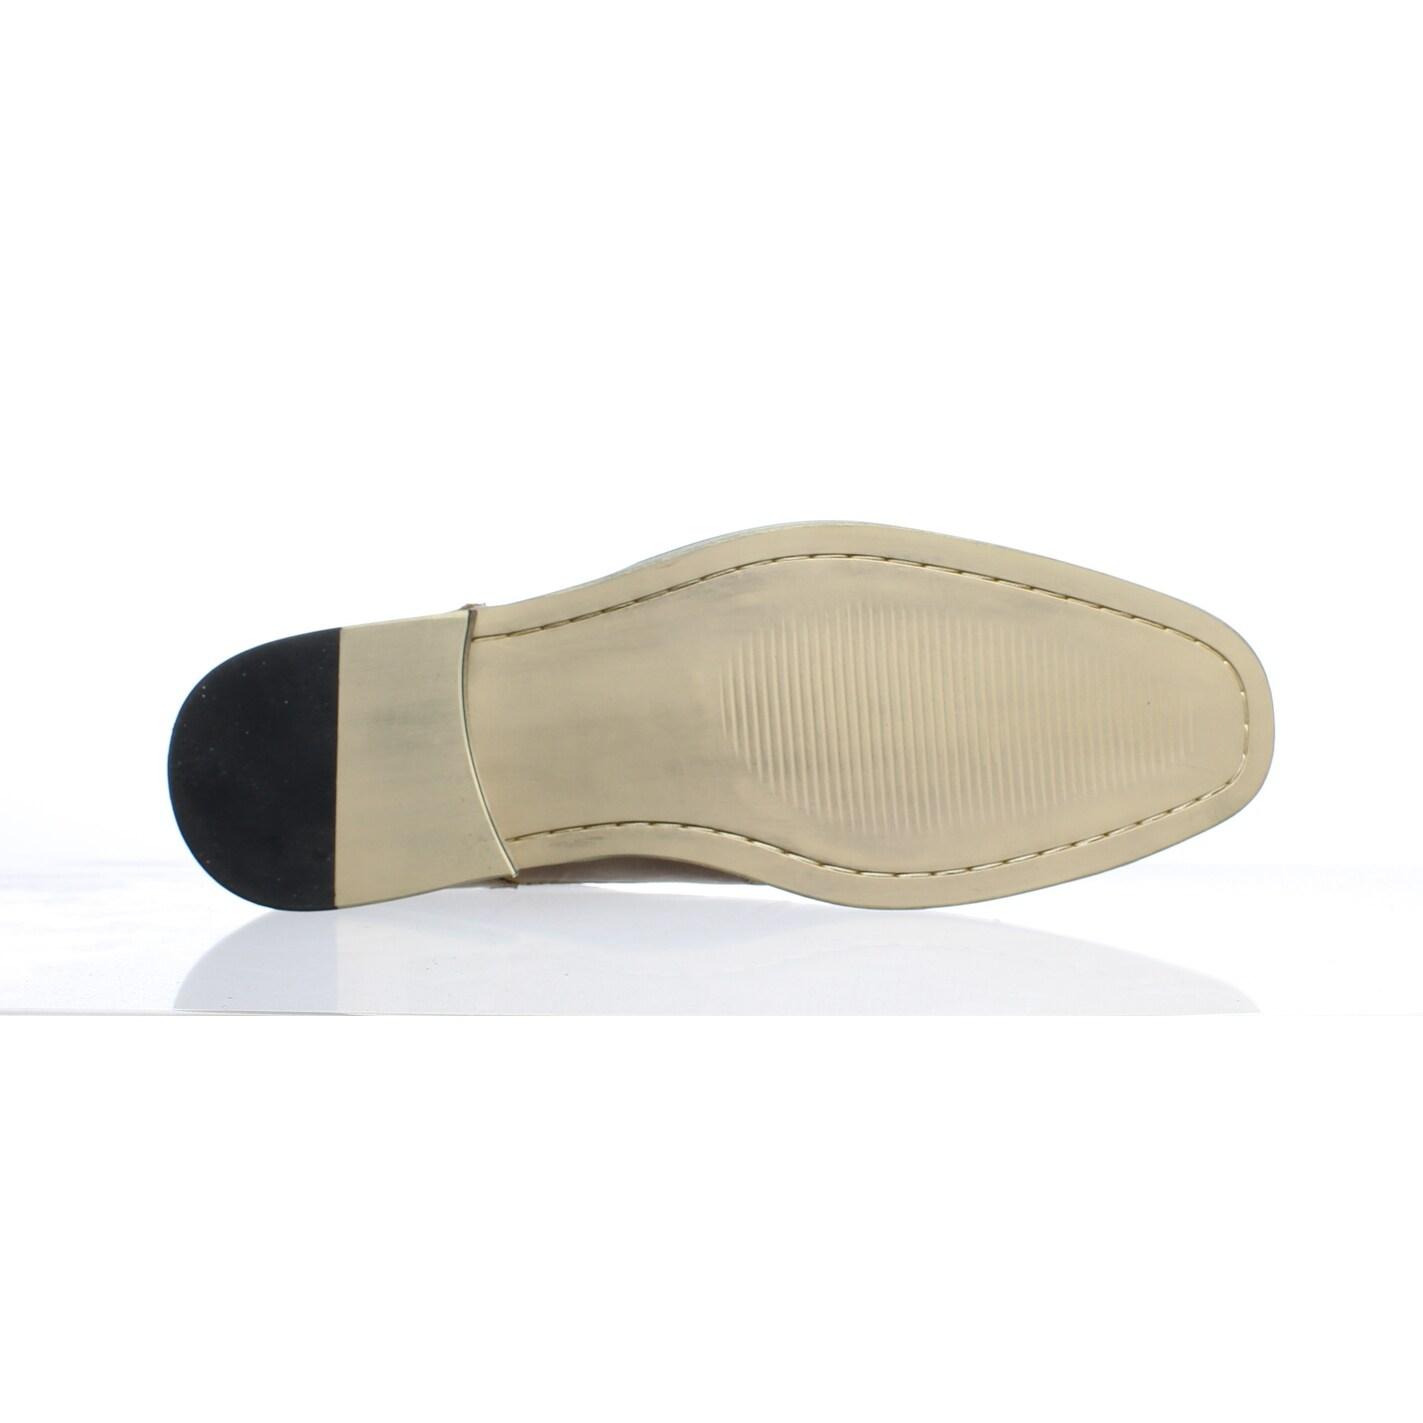 682aeca632f Steve Madden Mens Jagwar Tan Oxford Dress Shoe Size 8.5